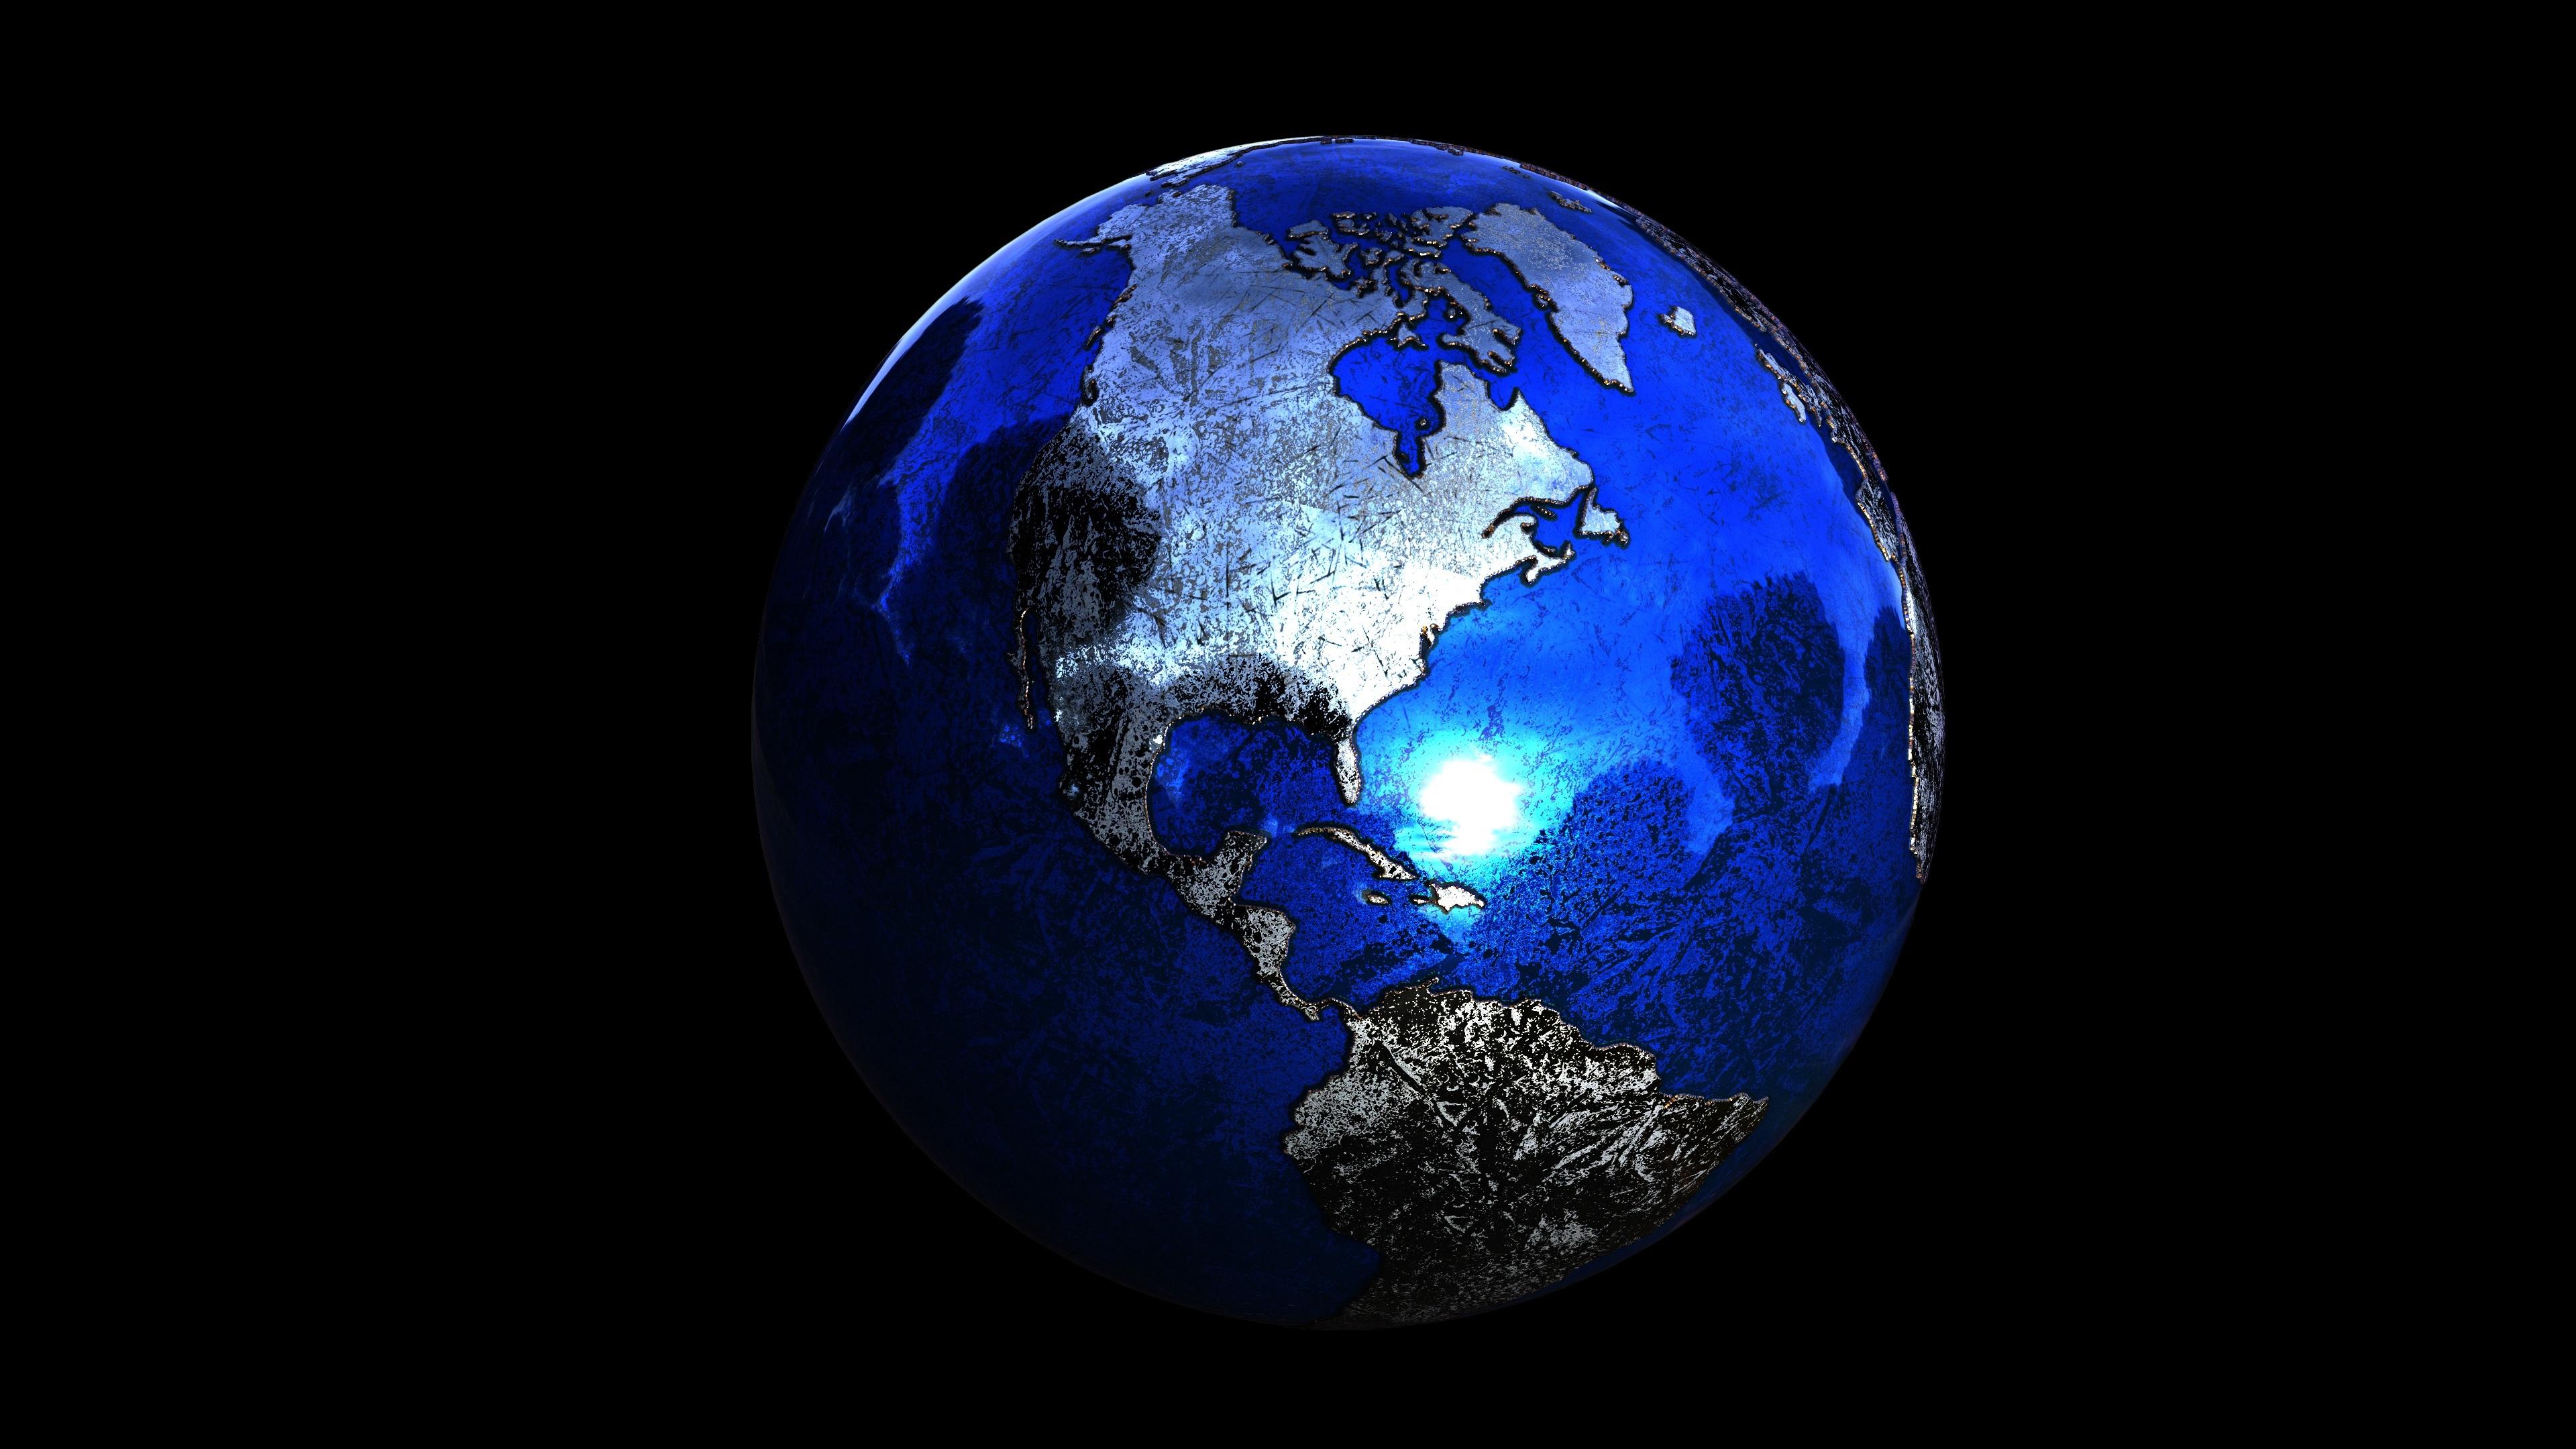 planet sphere globe 3d 4k 1536854862 - planet, sphere, globe, 3d 4k - Sphere, Planet, Globe